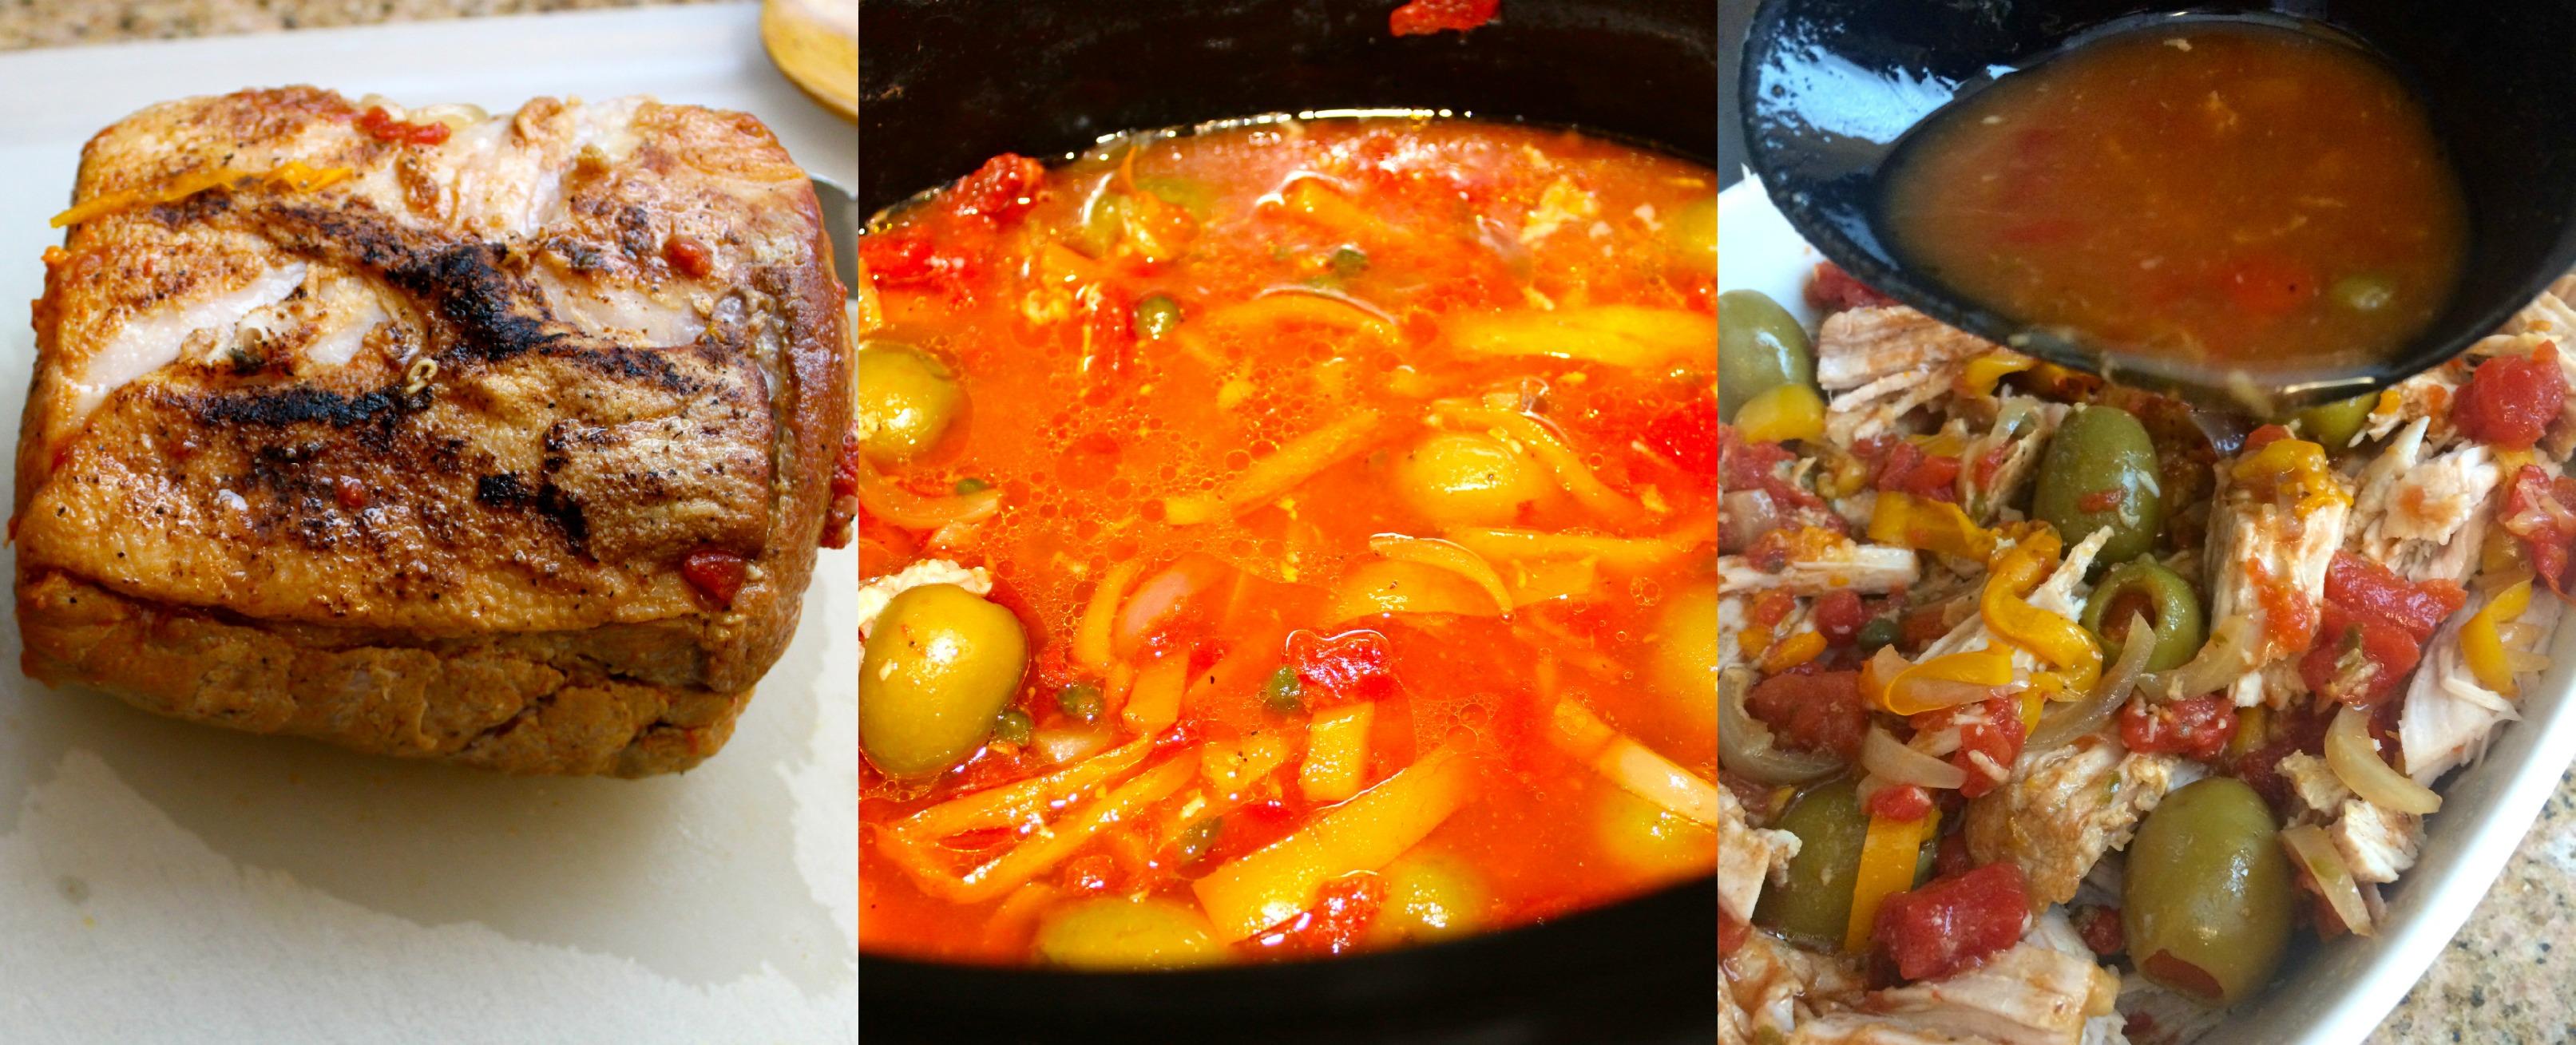 how to cook a tender pork loin roast